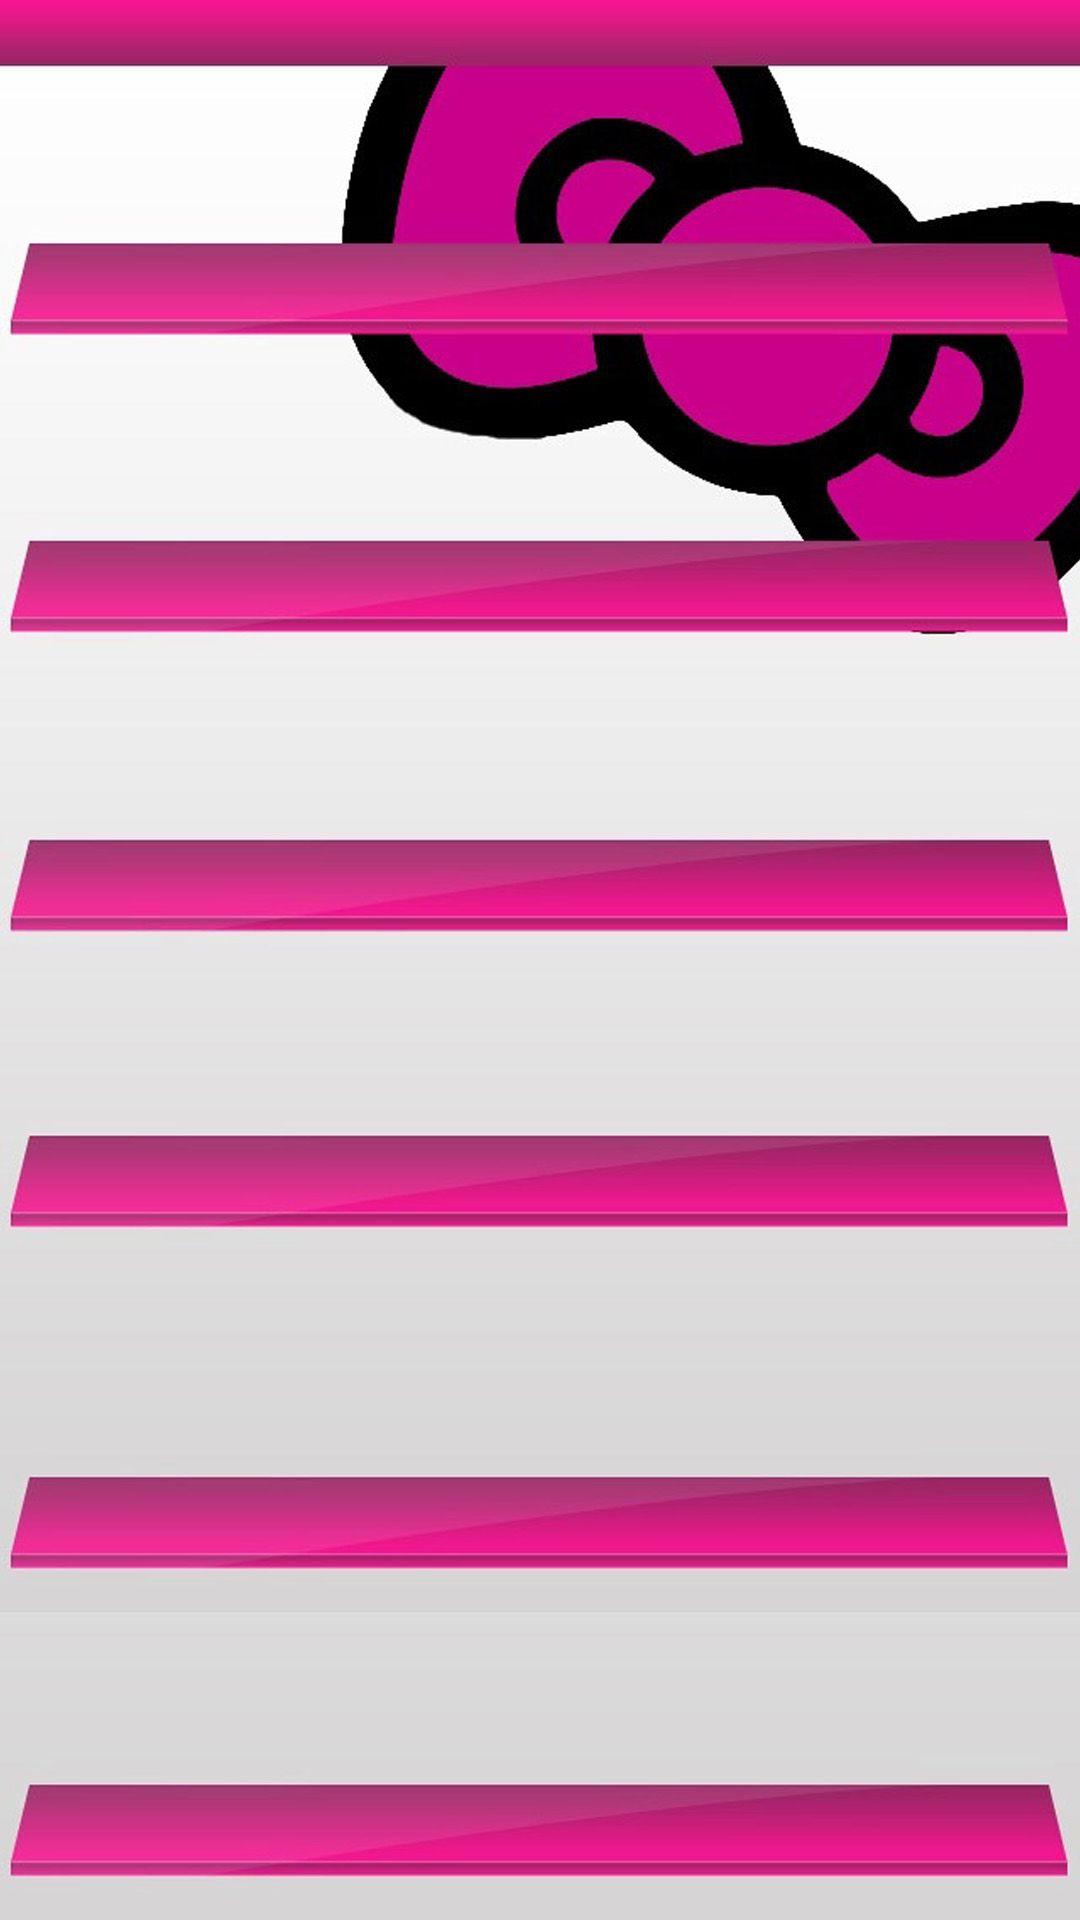 Www Bing Comhellao: Shelf IPhone Wallpaper 6 - Bing Images